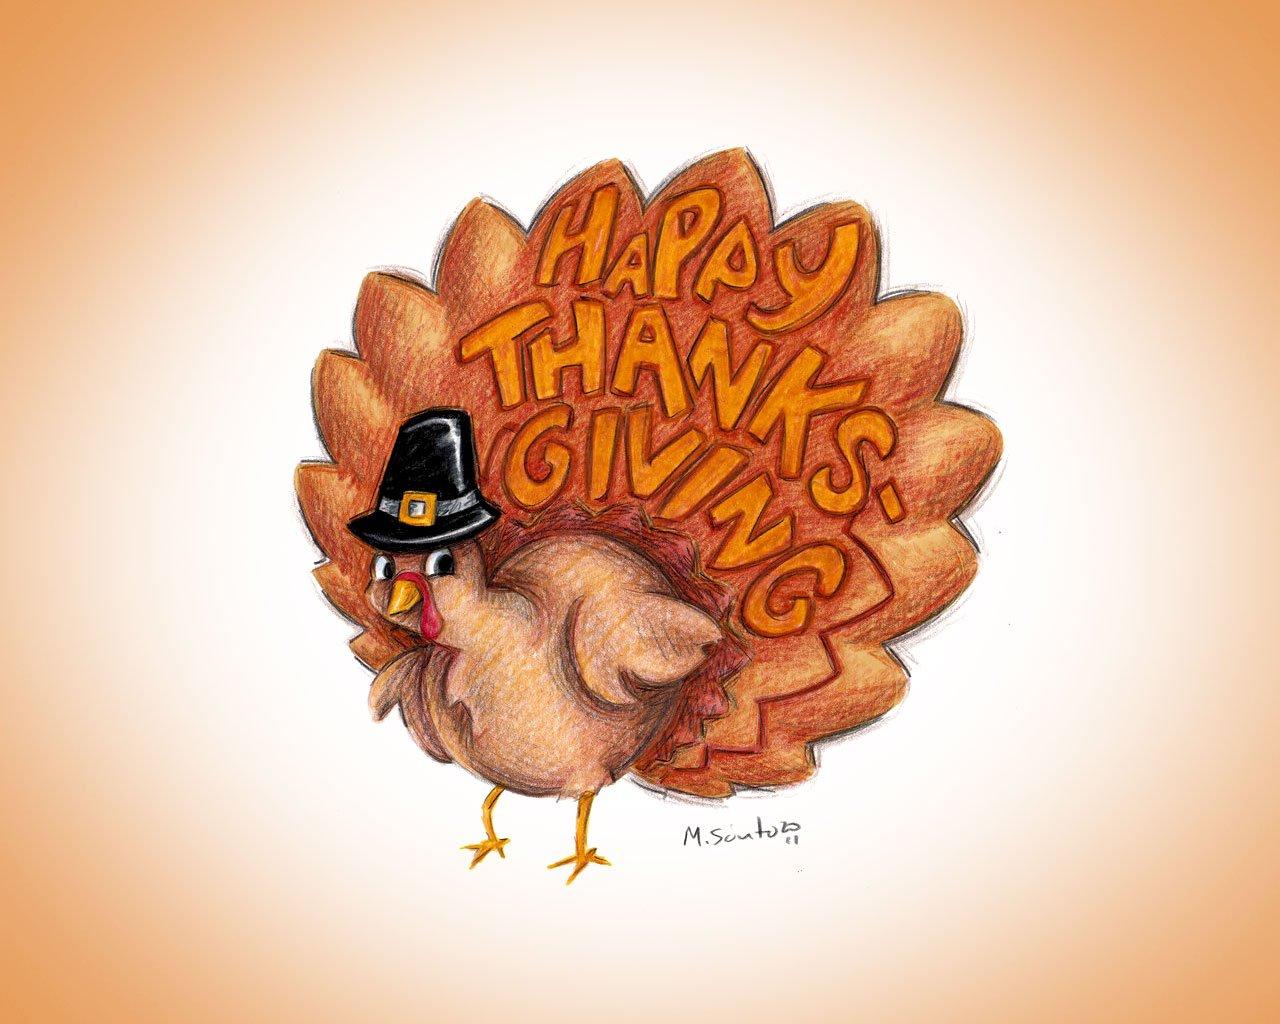 Thanksgiving 2013 date